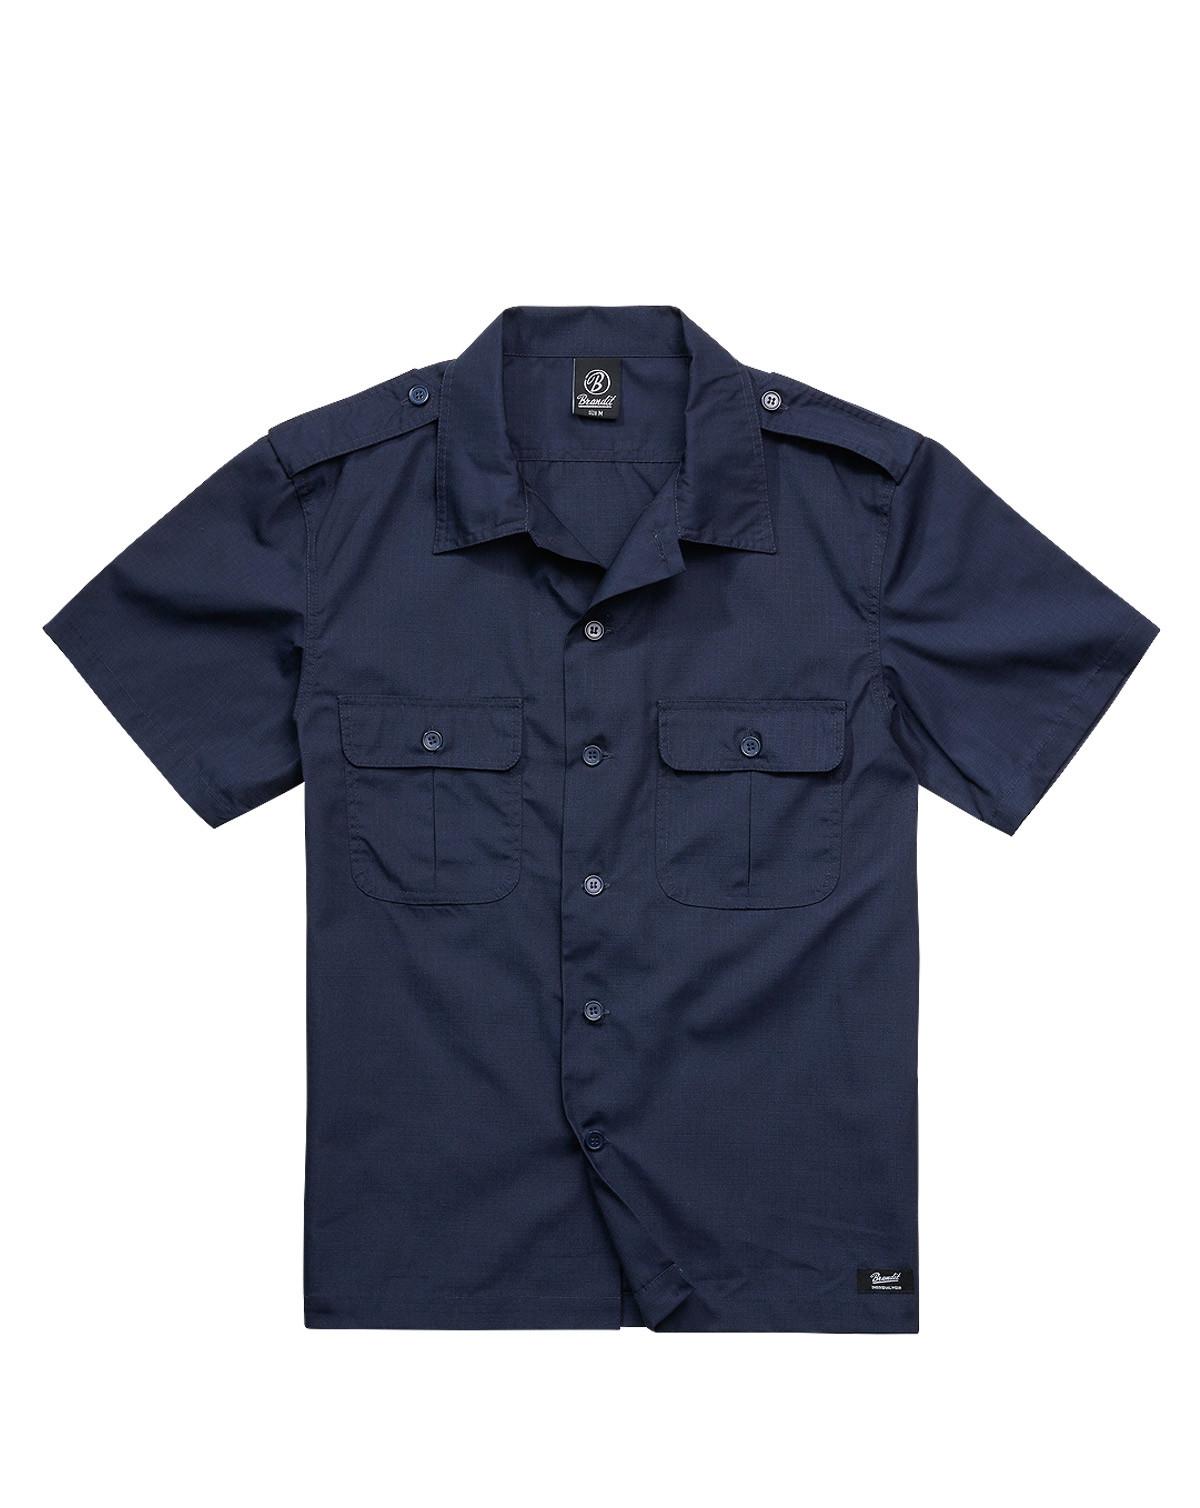 Brandit U.S. Army Shirt Ripstop (Navy, XL)